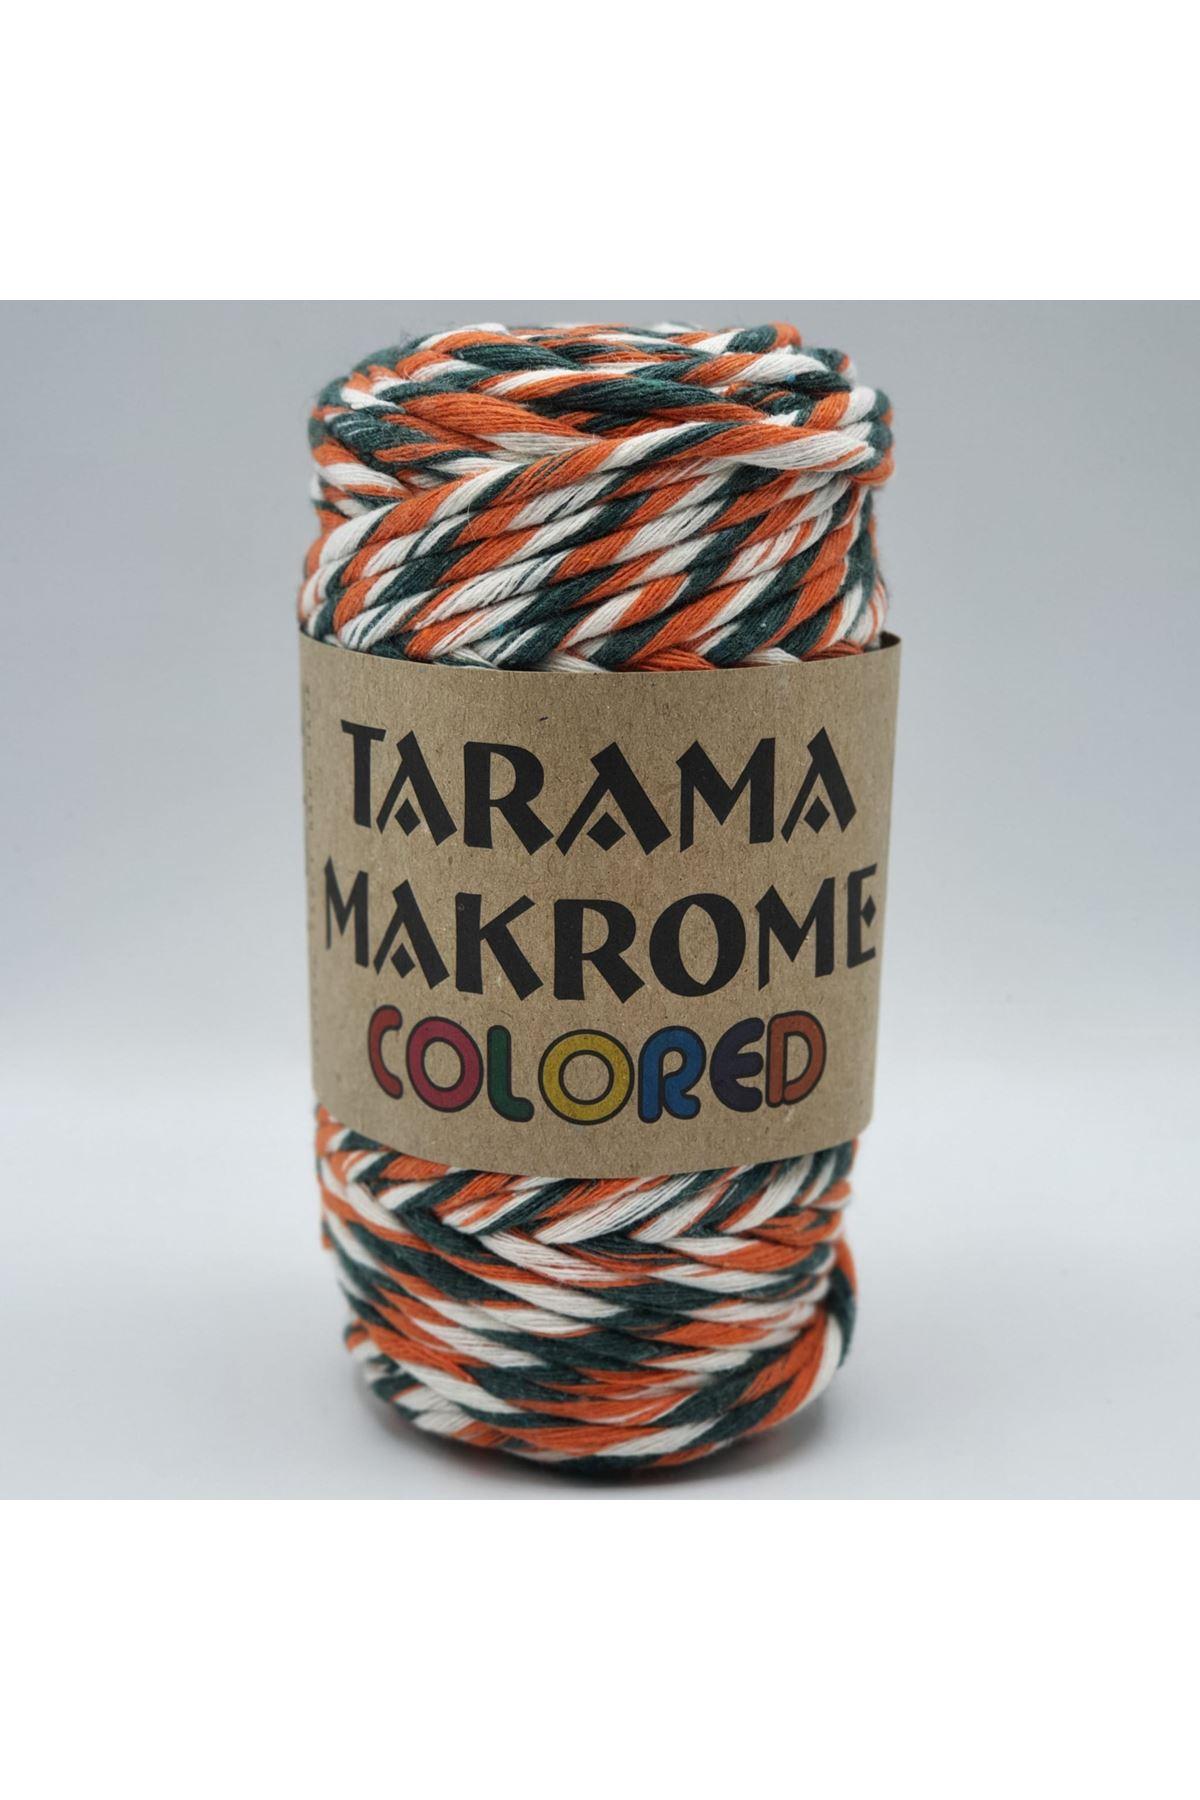 Tarama Makrome Colored 5 mm - 14